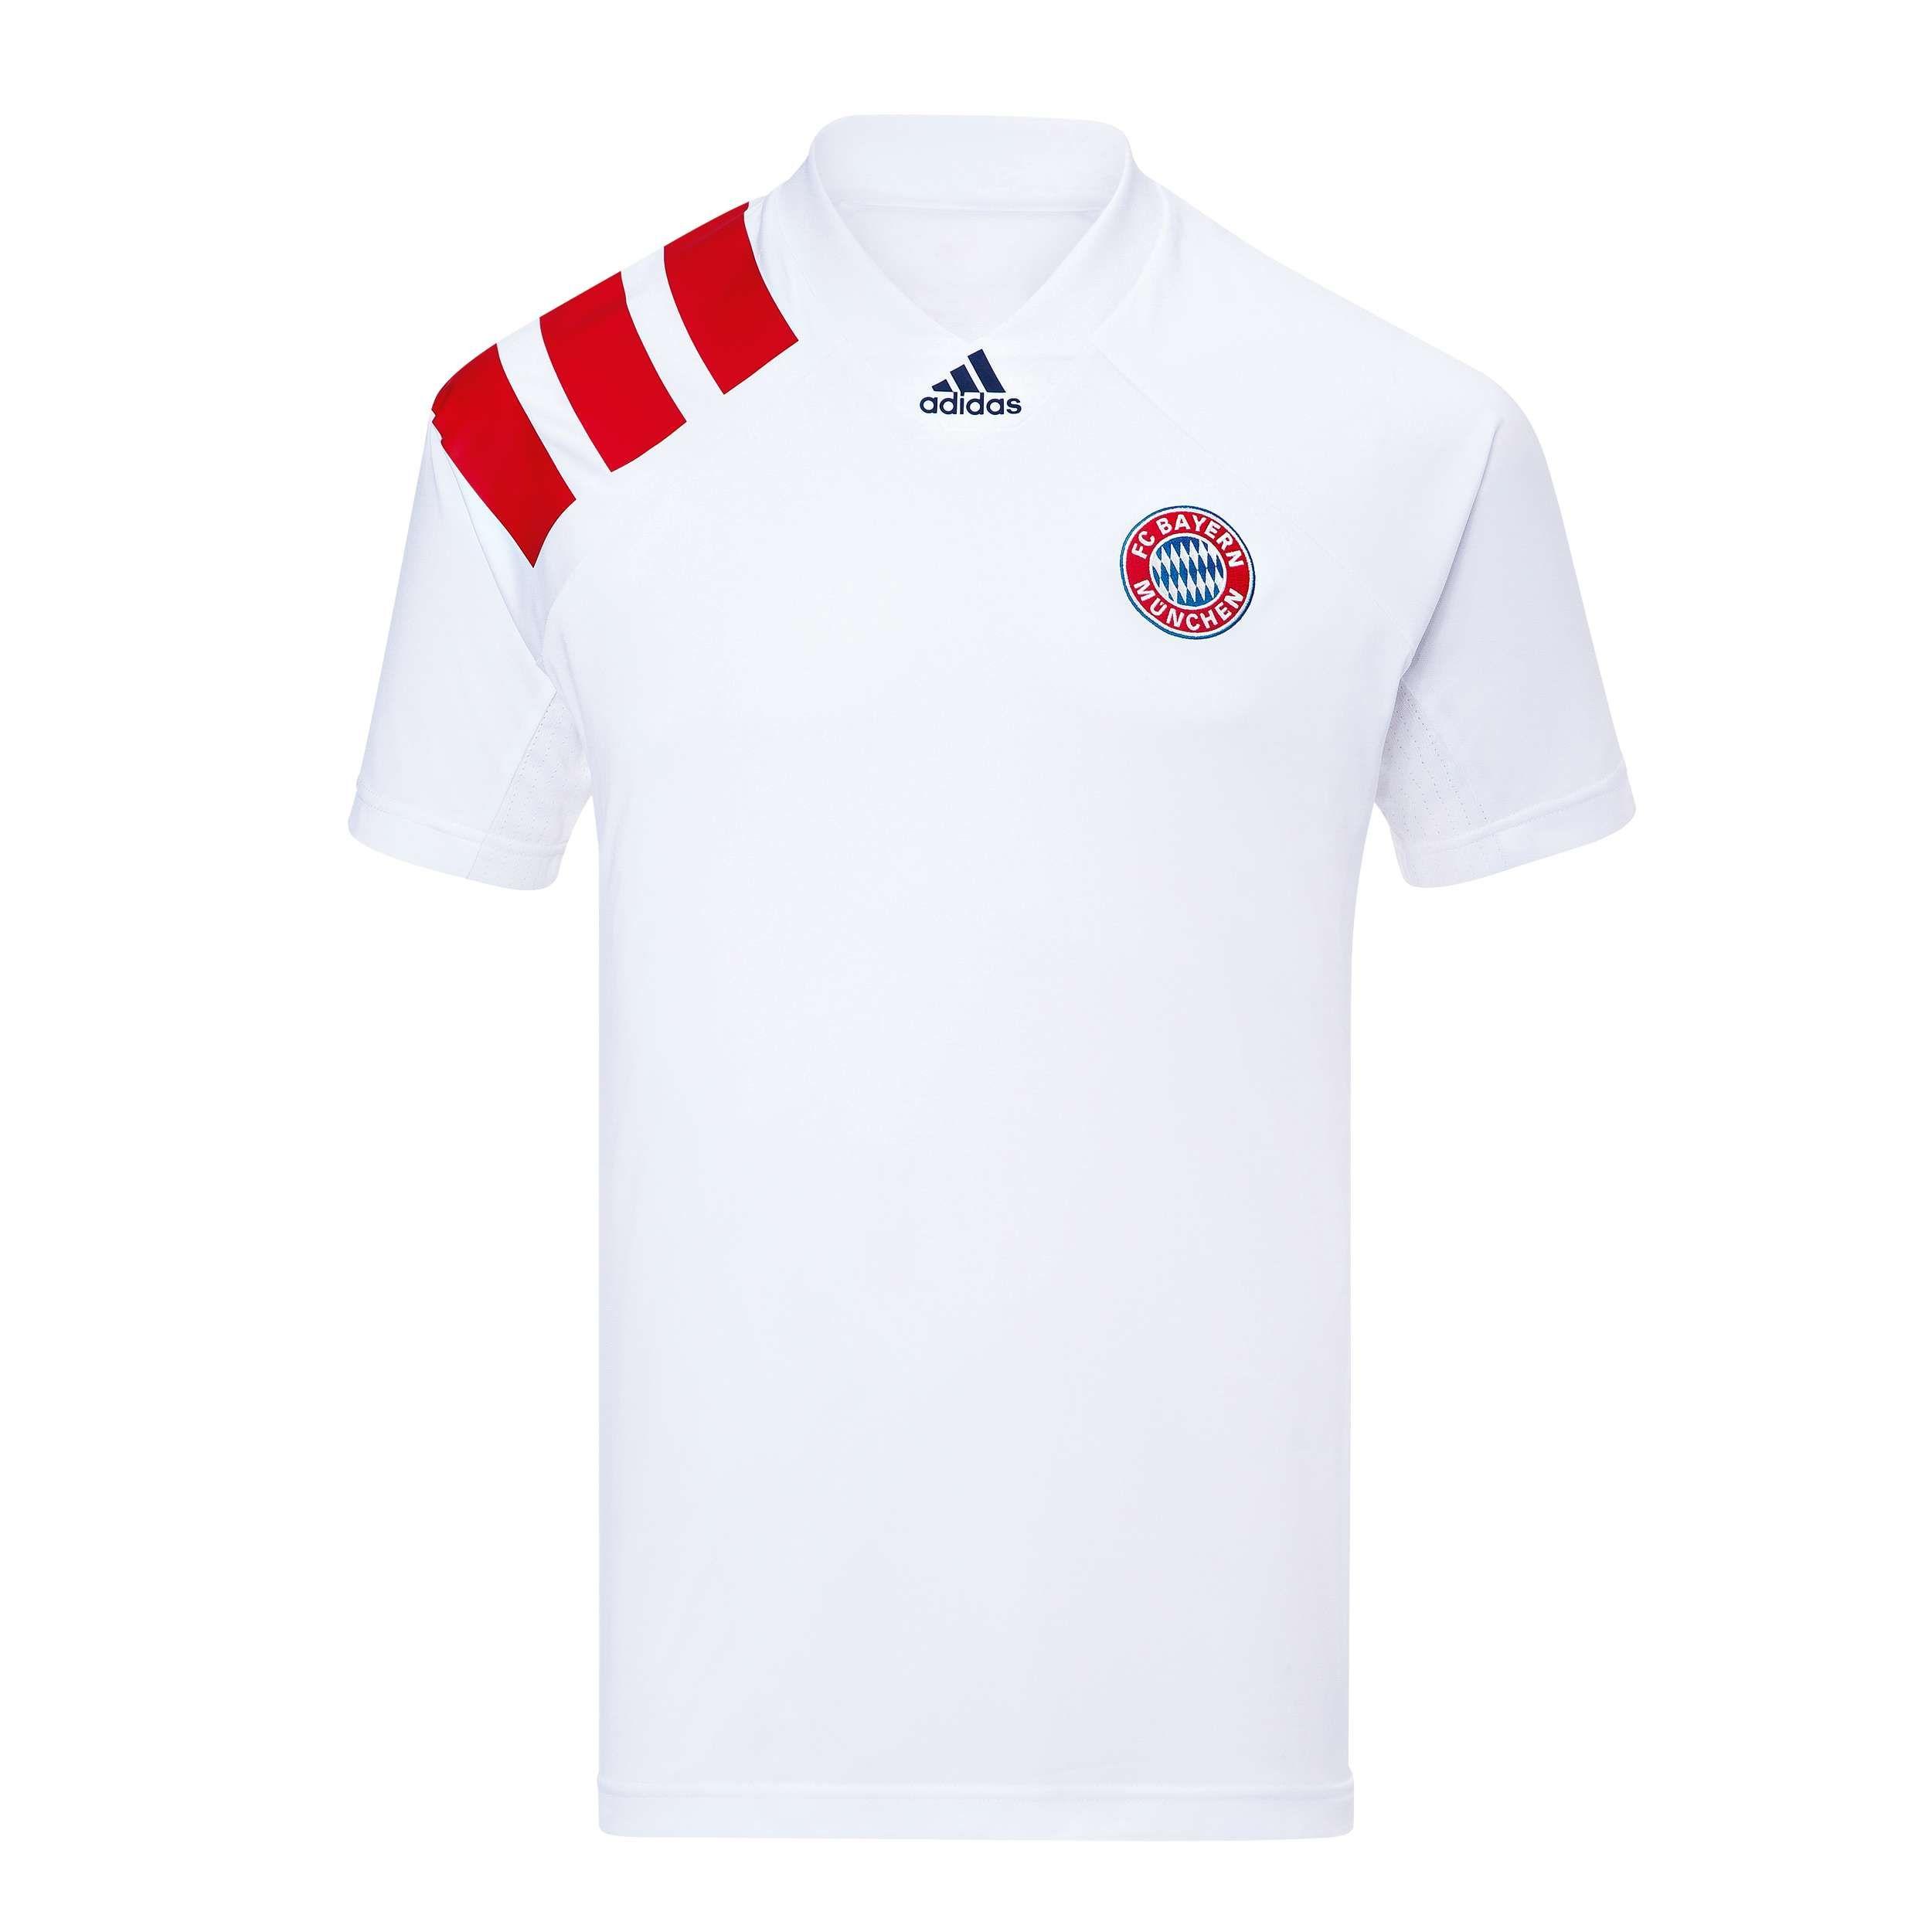 9e461faaf732a adidas Lifestyle Icon Shirt, 2019 | Eşofman | Adidas, Shirts ve Mens ...